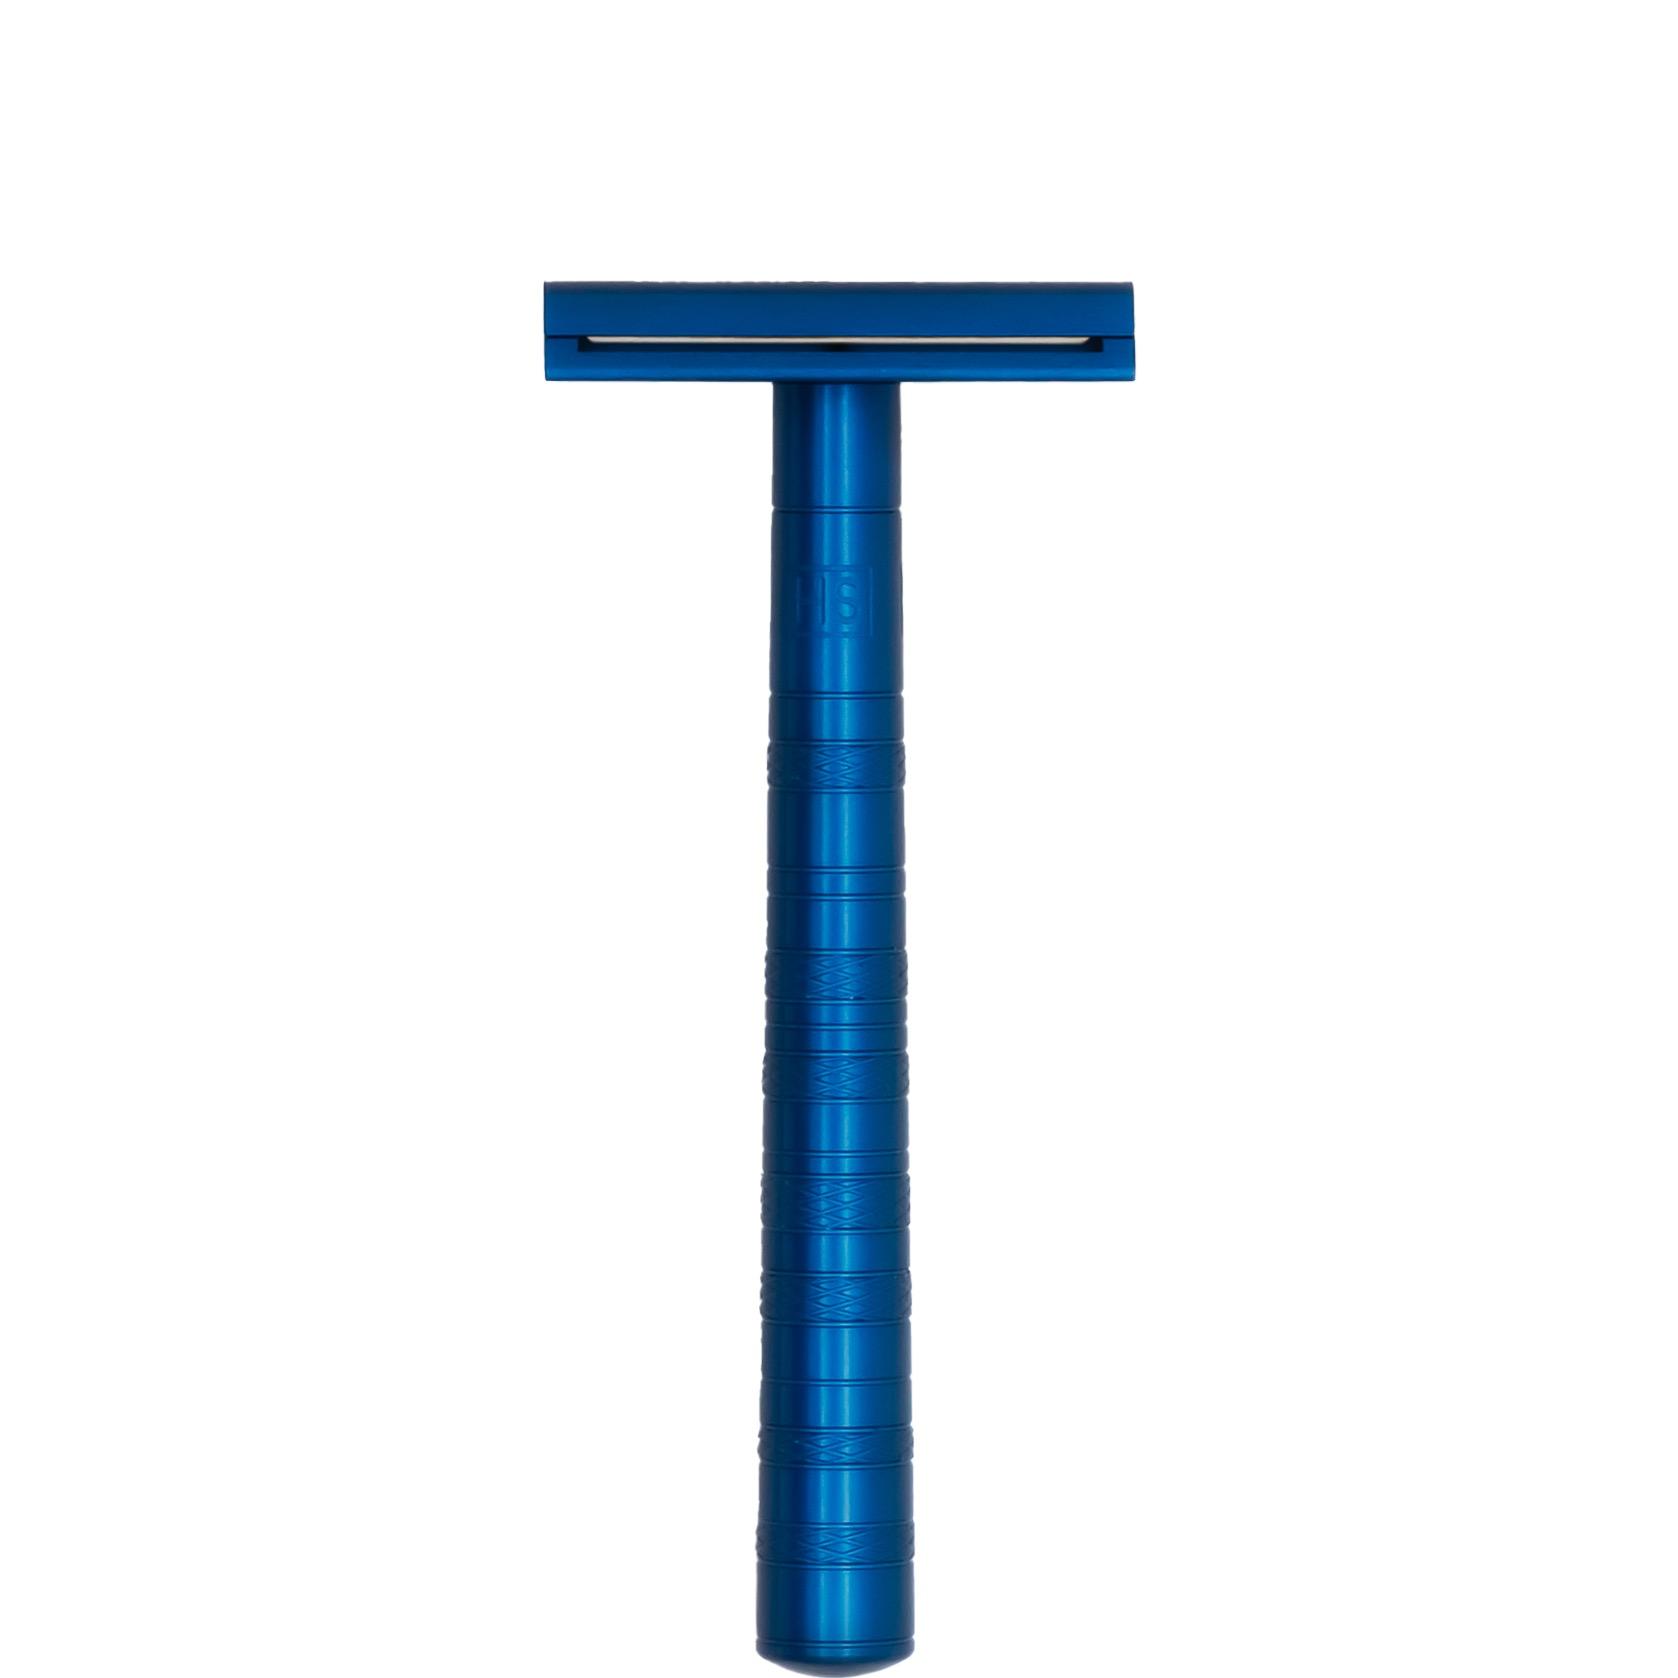 Safety Razor AL13 - Mild - Steel Blue